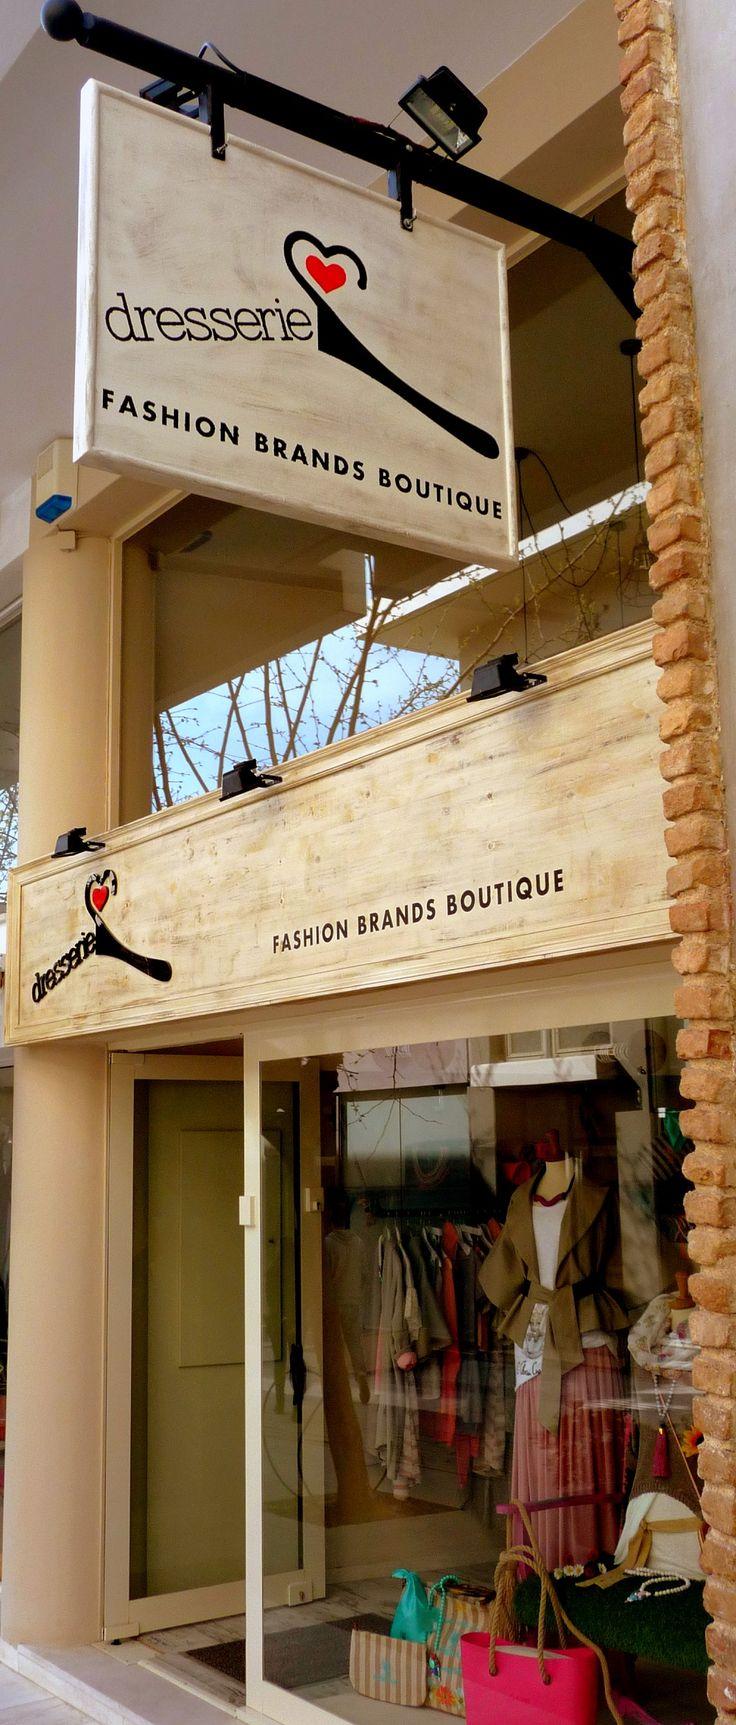 Shop front fashion boutique | by Nikos Kyriazis